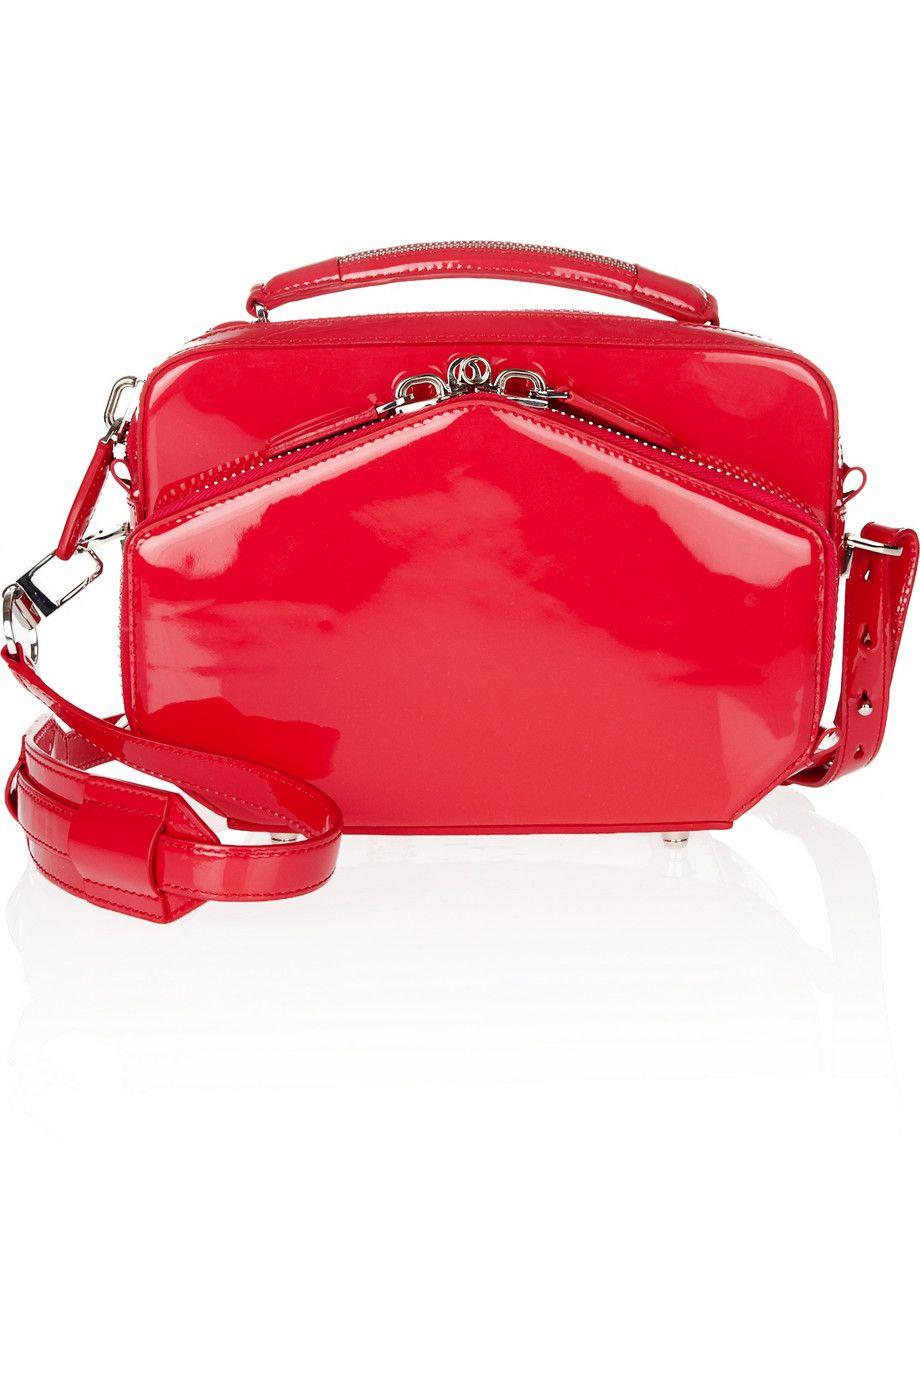 9ef2bac1c8b0 Rafael patent-leather shoulder bag by Alexander Wang  red  handbags ...